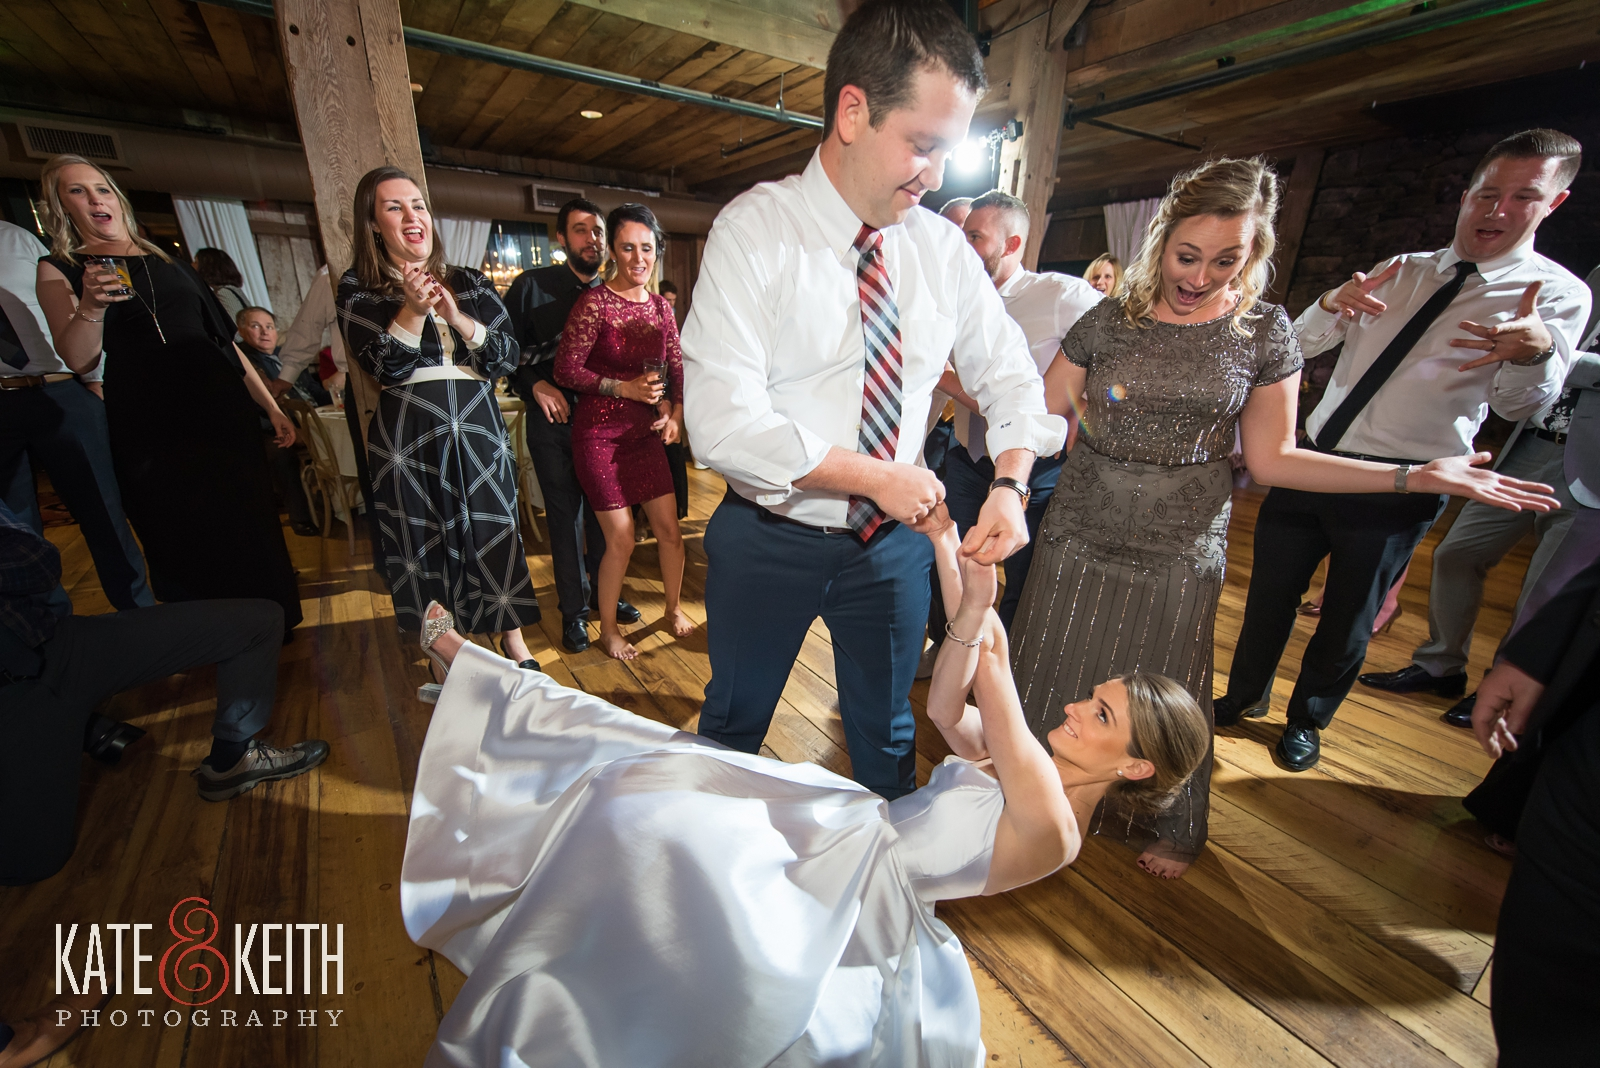 Barn on the Pemi winter wedding, bride dancing, Splash band, reception, groomsmen, barn dance floor, barn reception,bridesmaid, maid of honor, dance moves, wedding dancing, candid wedding photography